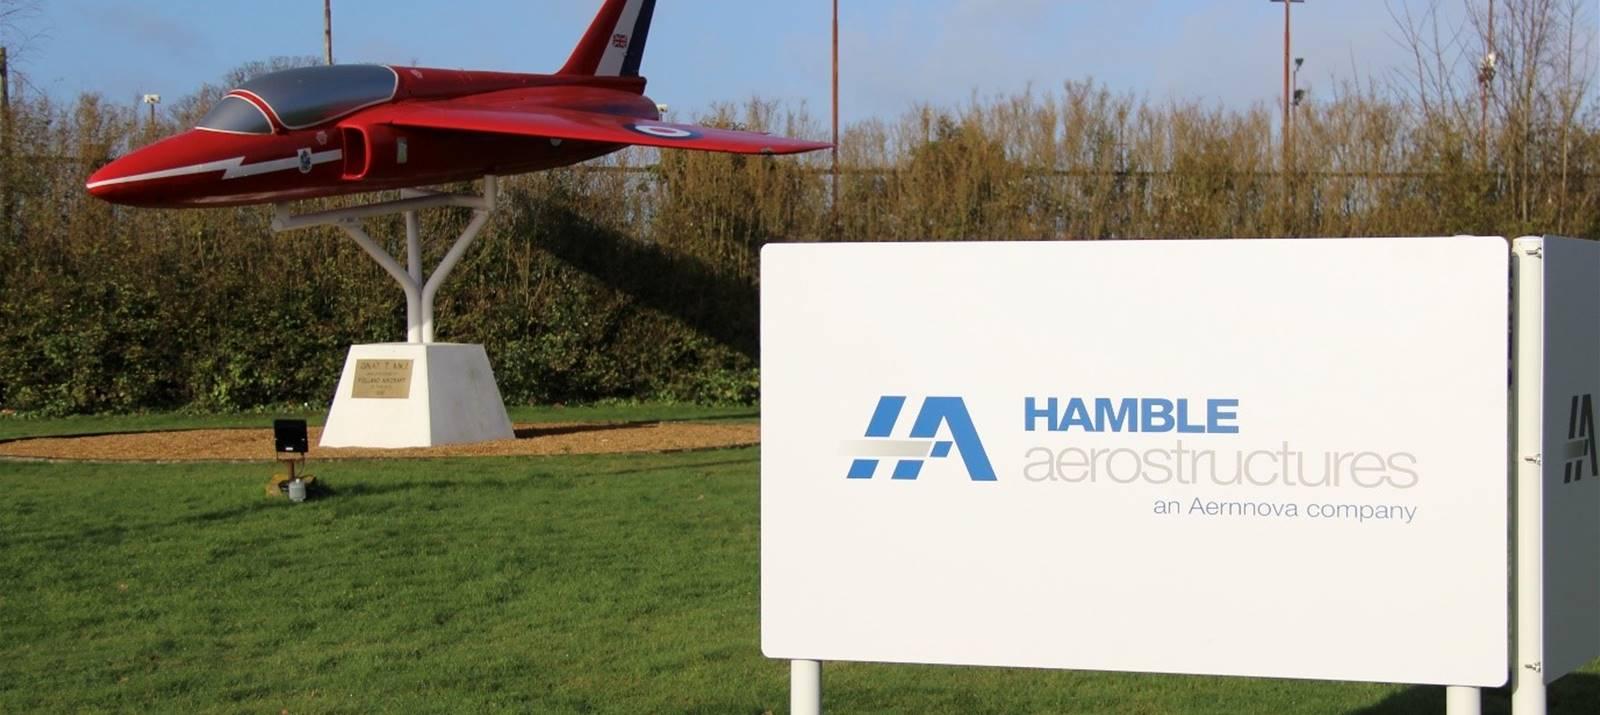 Hamble Aerostructures